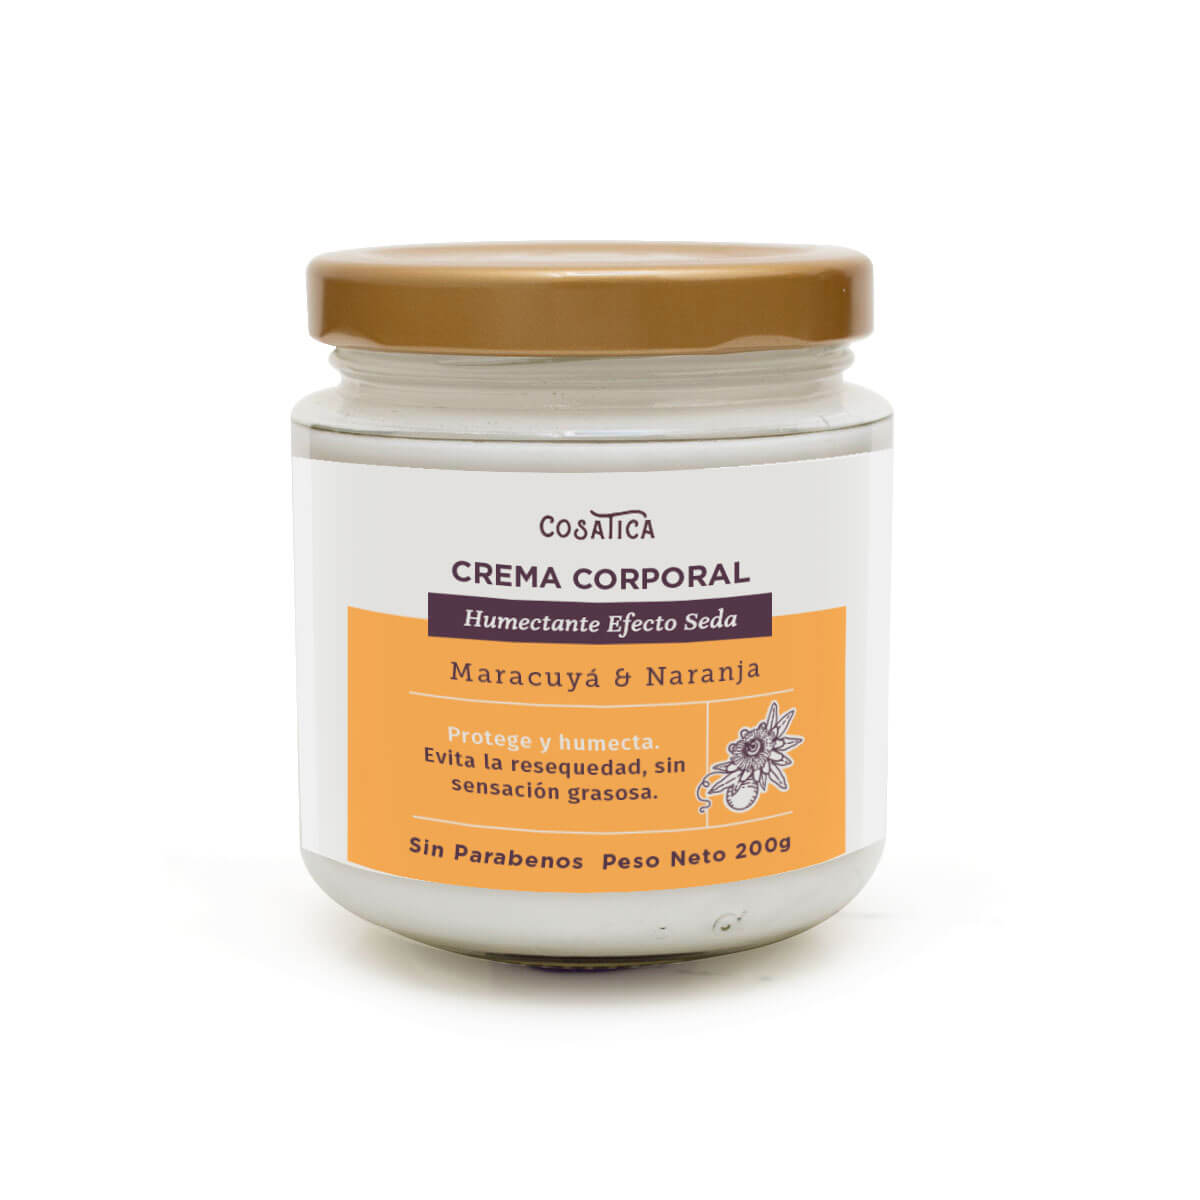 Crema Corporal Ecológica